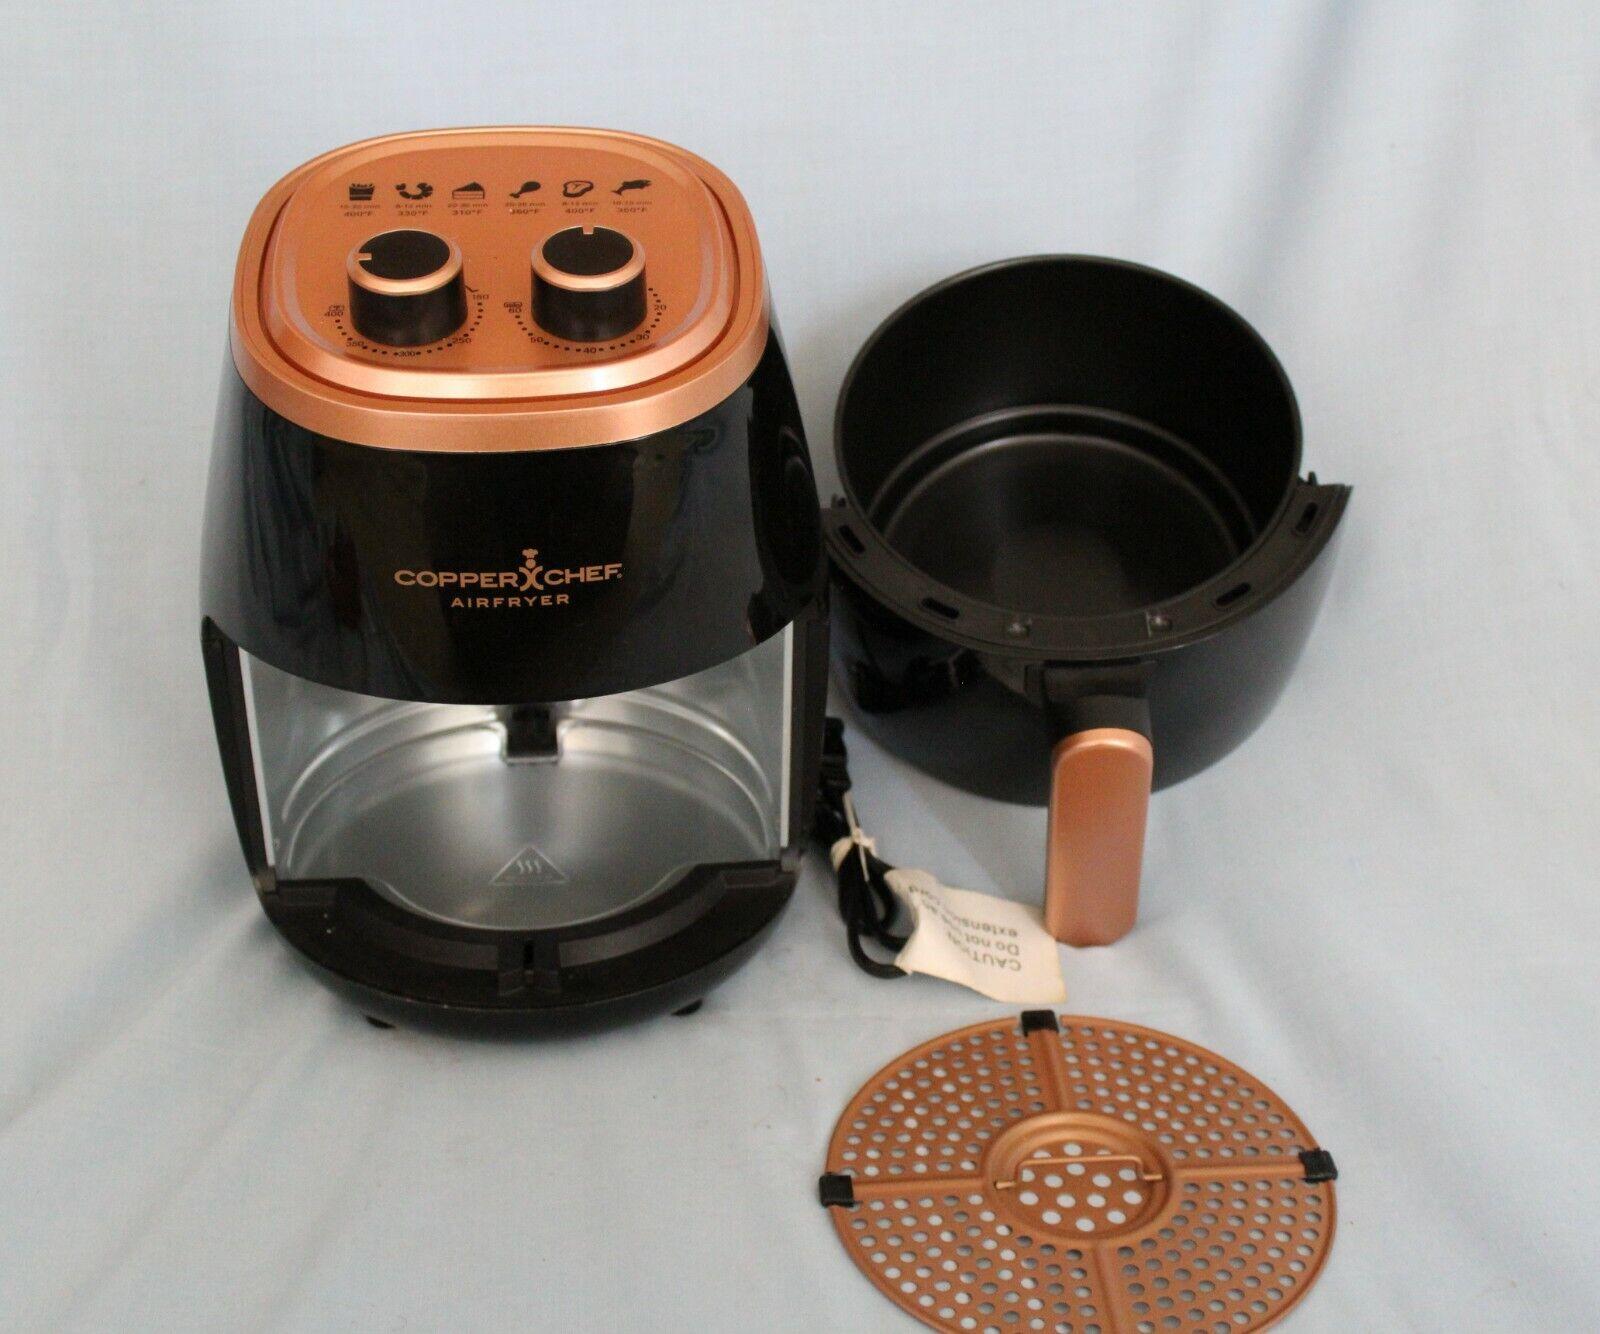 Copper Chef Air Fryer